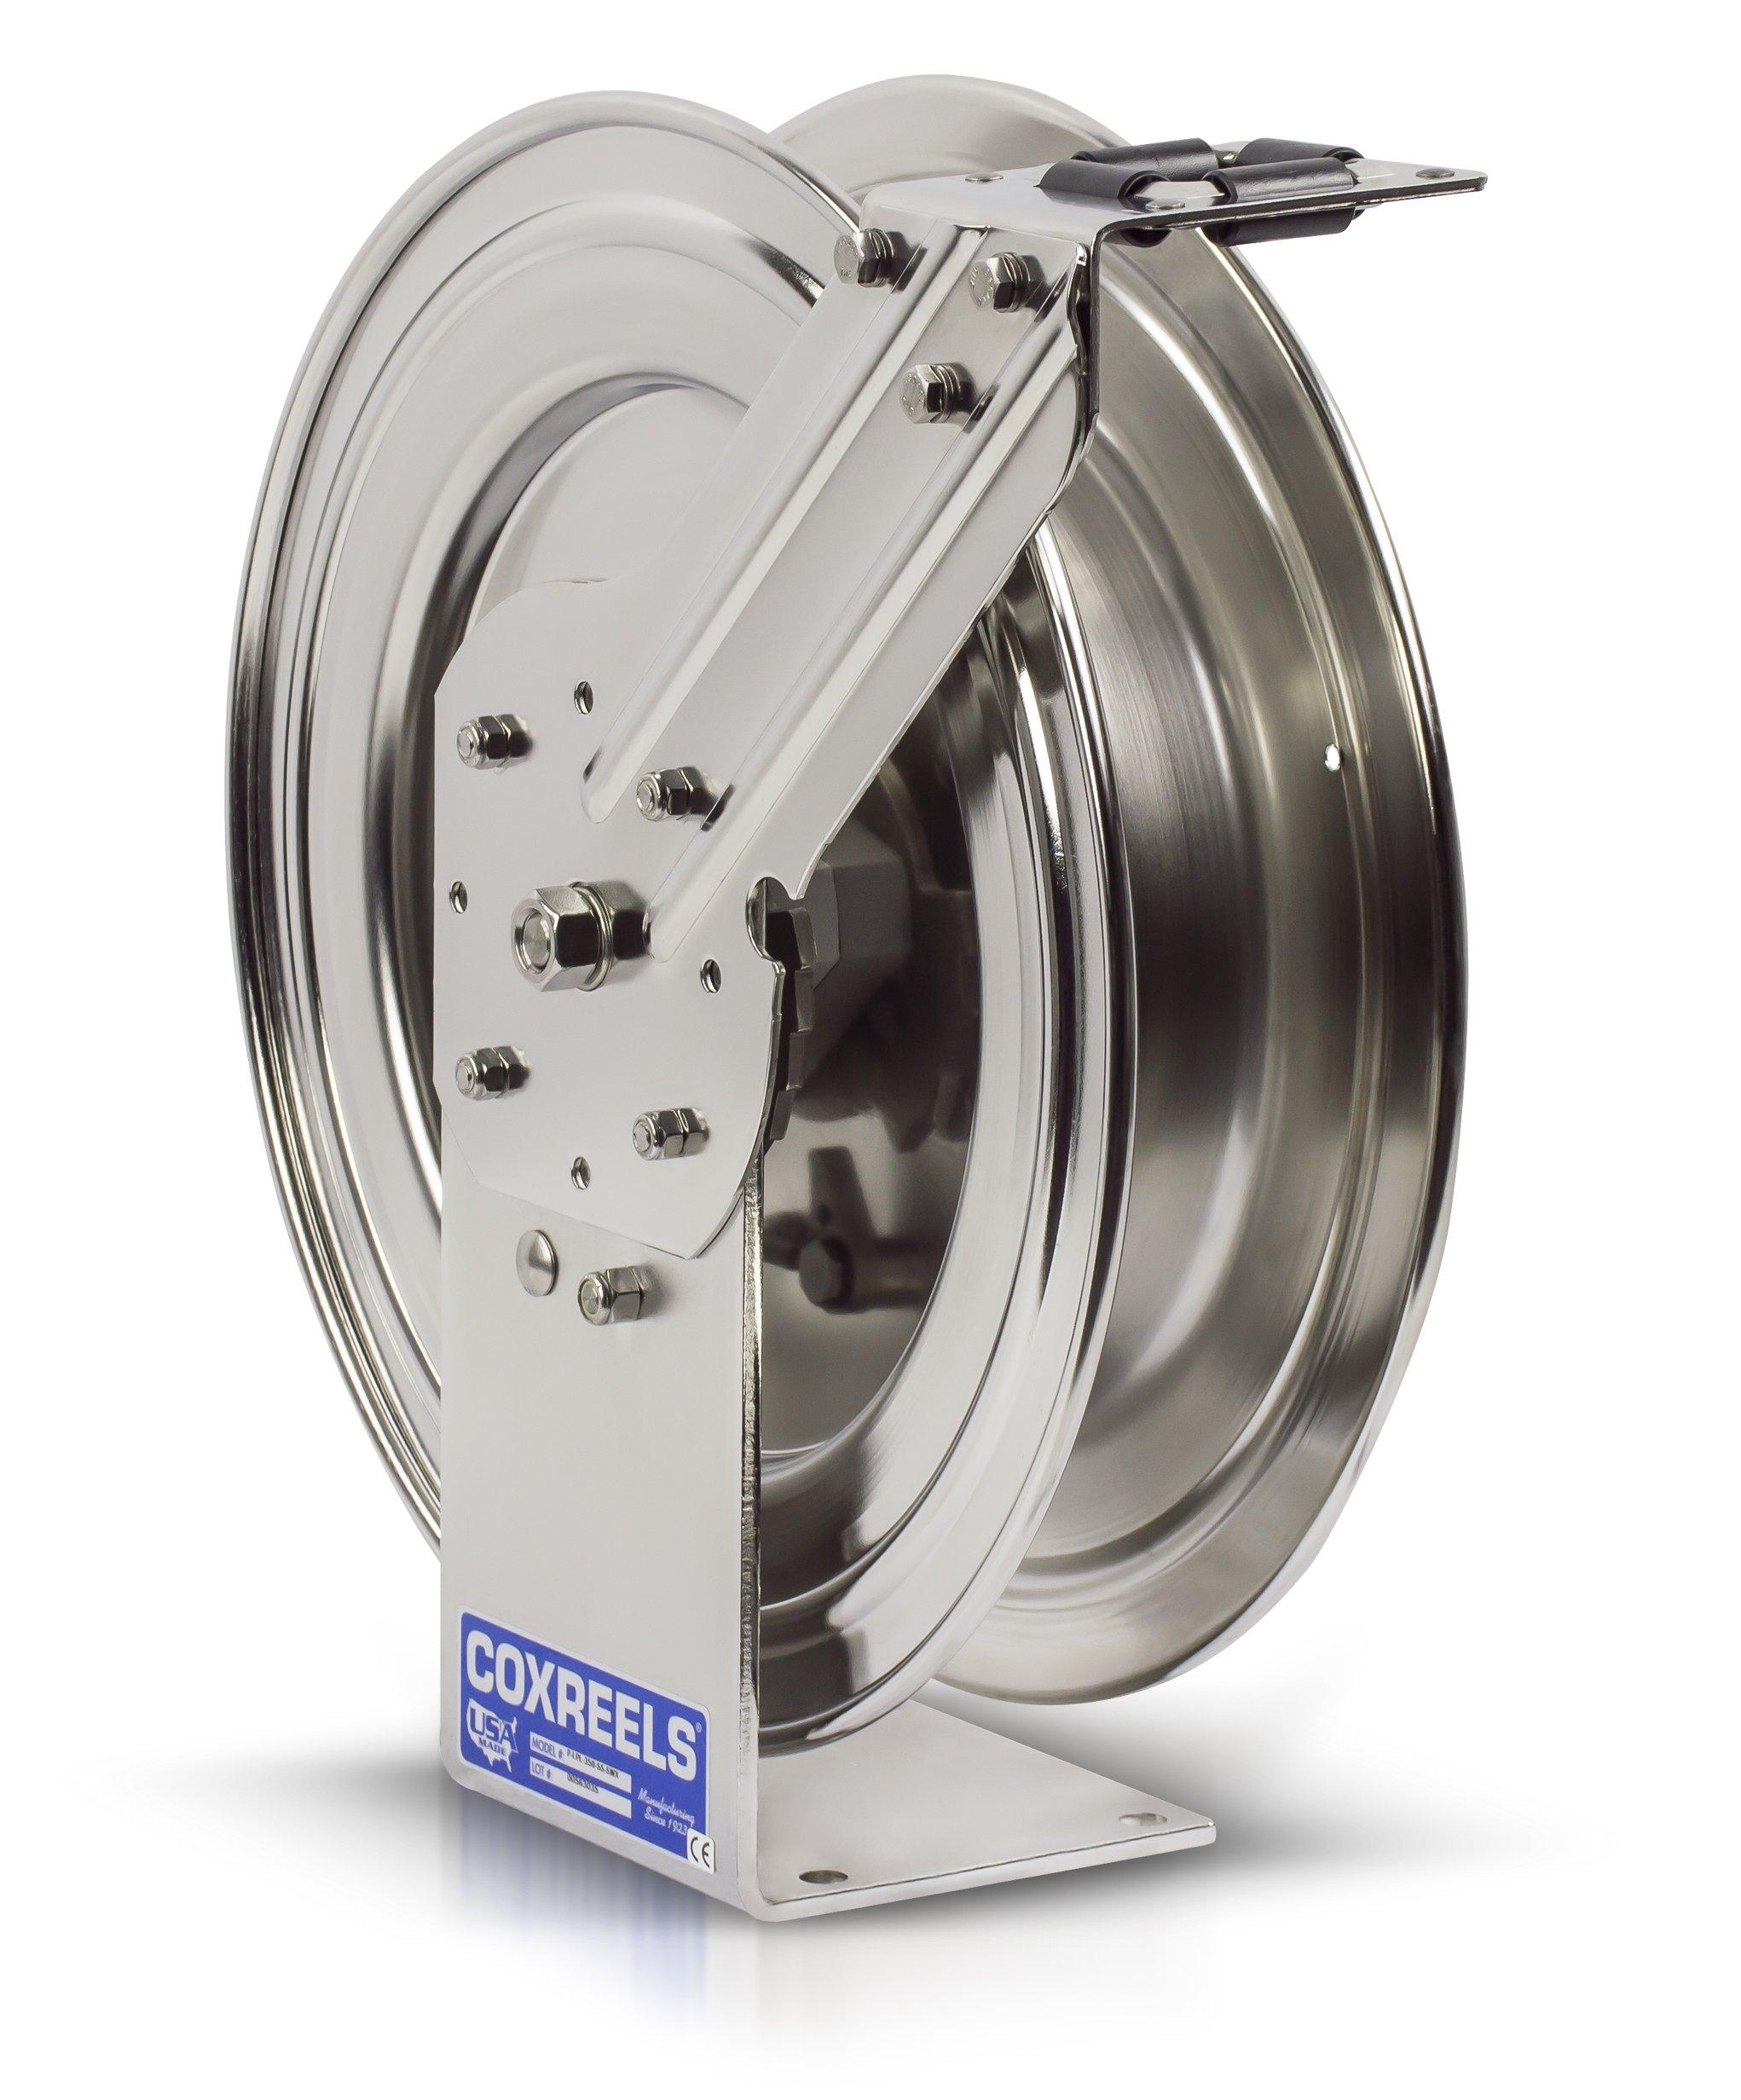 Coxreels P-LPL-425-SS Stainless Steel Spring Rewind Hose Reel: 1/2'' I.D, 25' hose capacity, less hose, 300 PSI